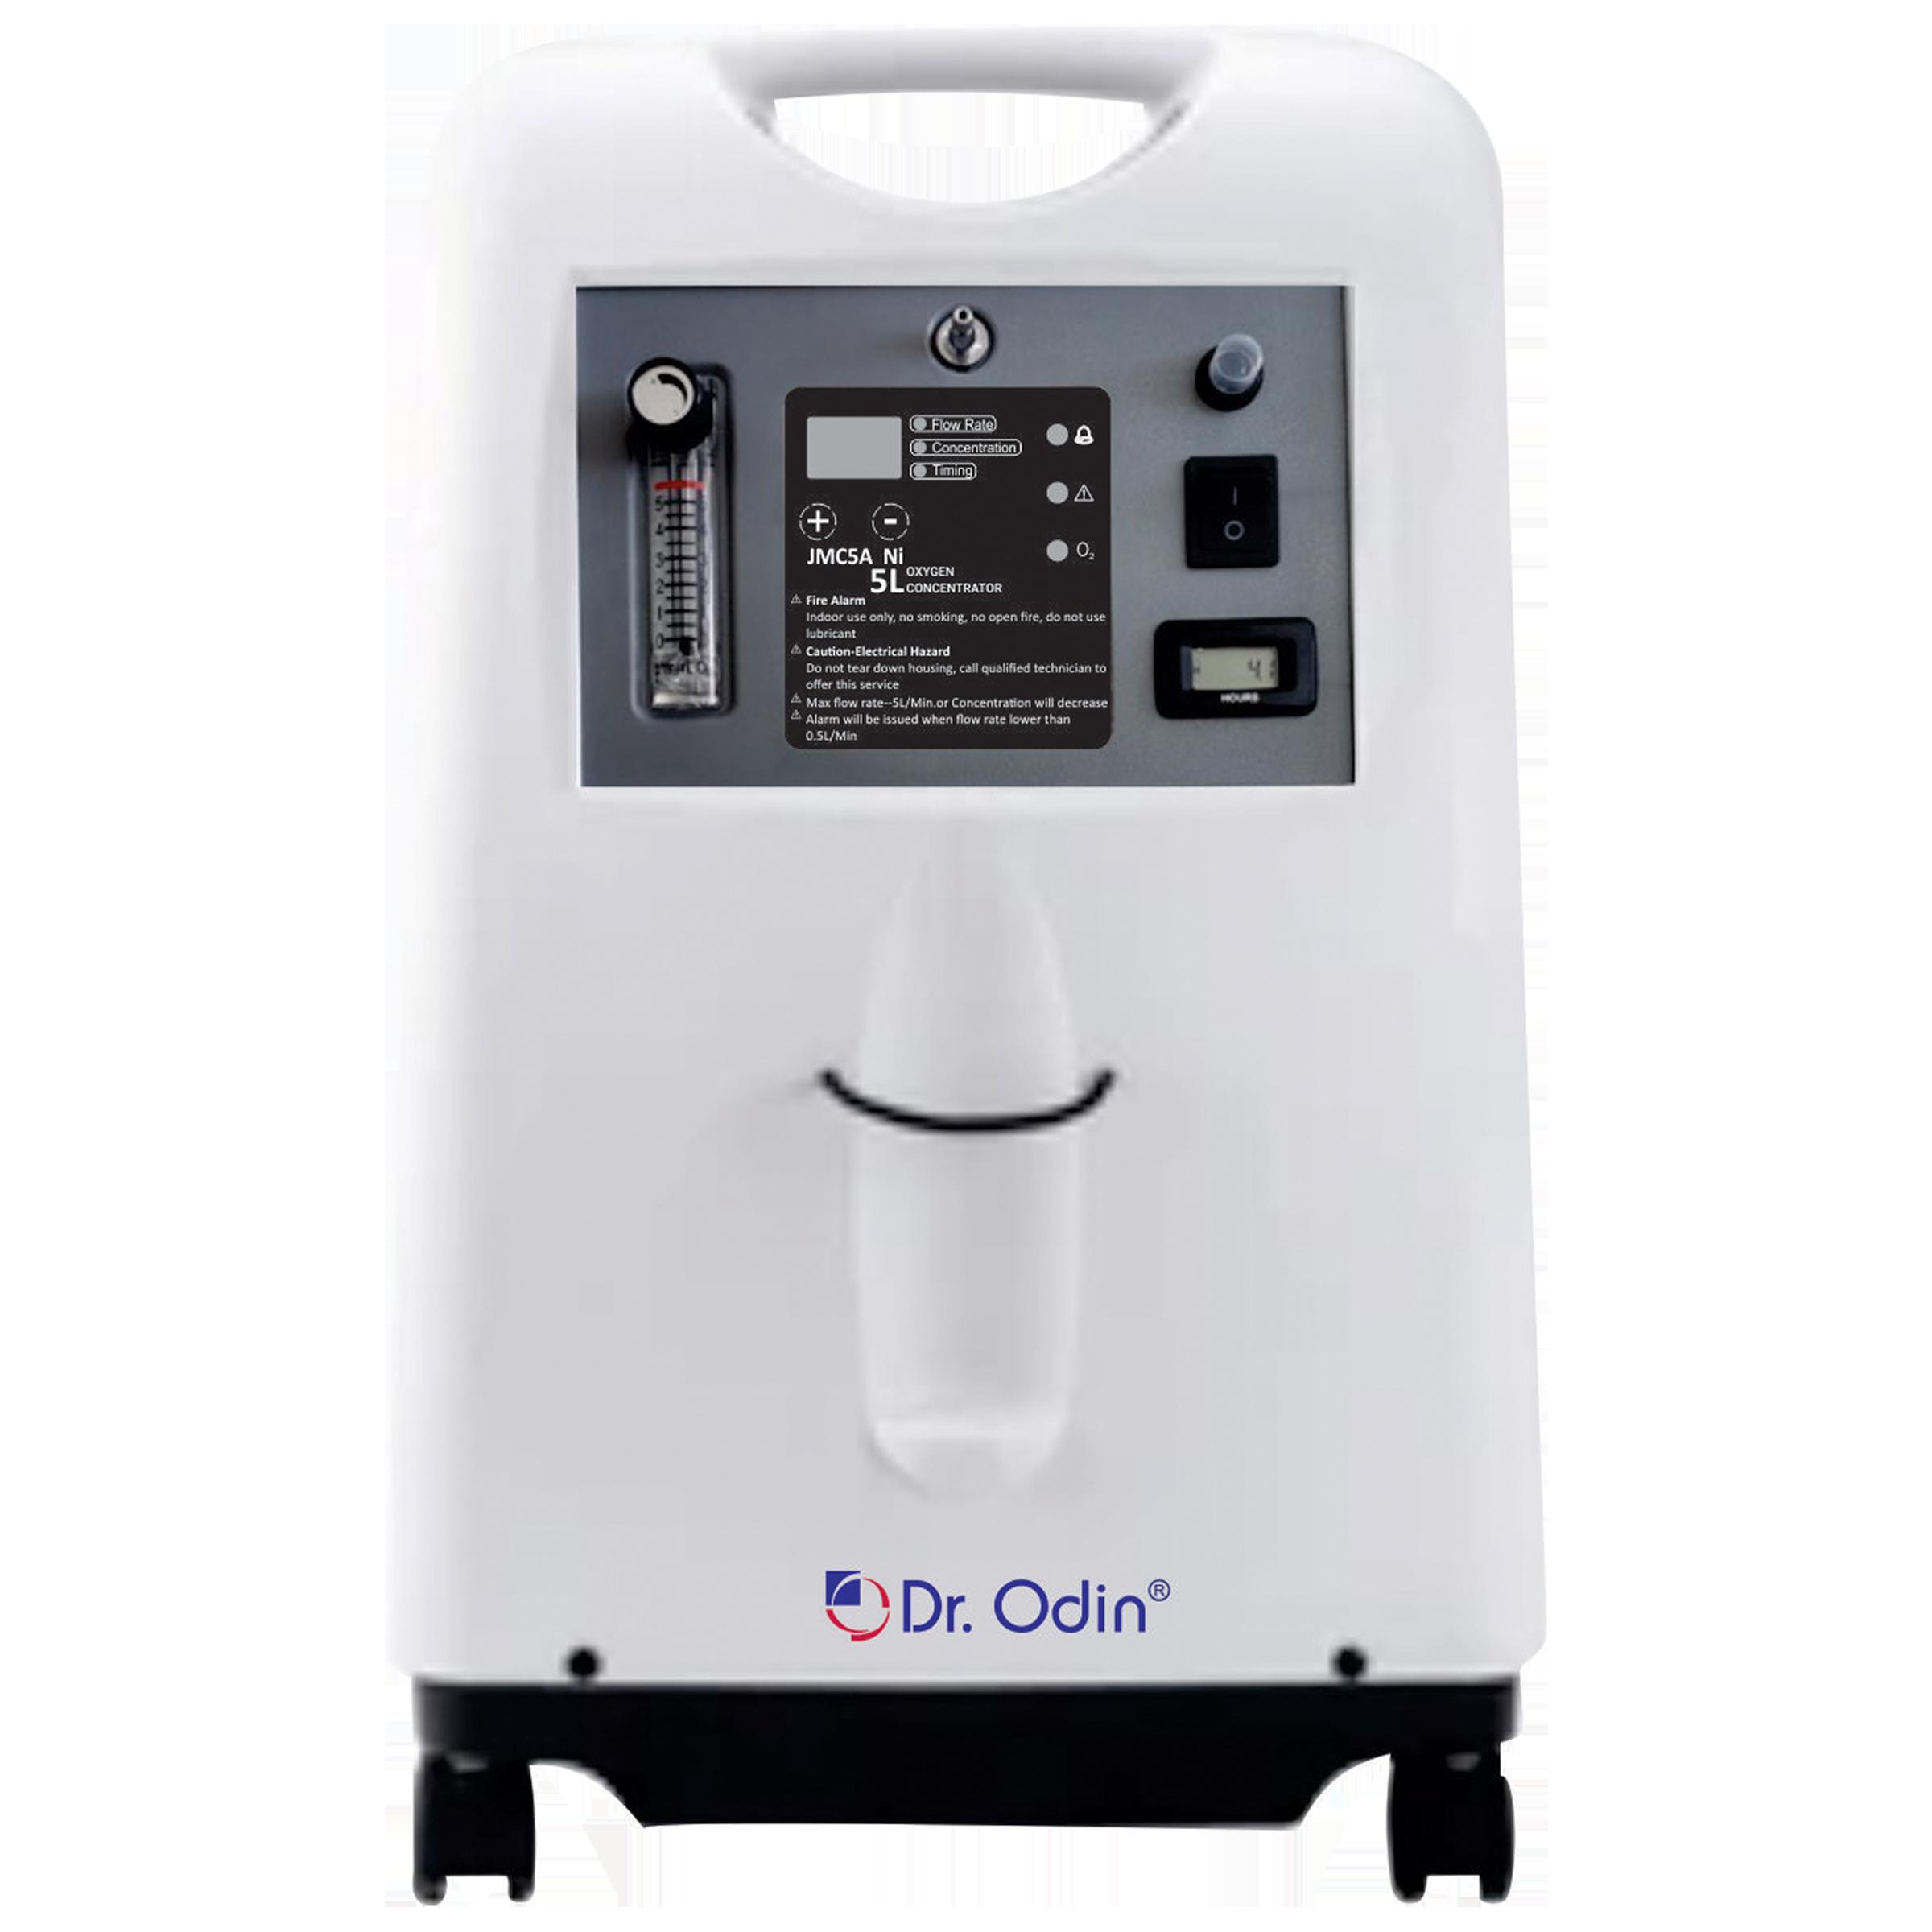 Dr. Odin Oxygen Concentrator (Oxygen Concentration: 0.5~5L/min, 93%+-3%, JMC5A-Ni, White)